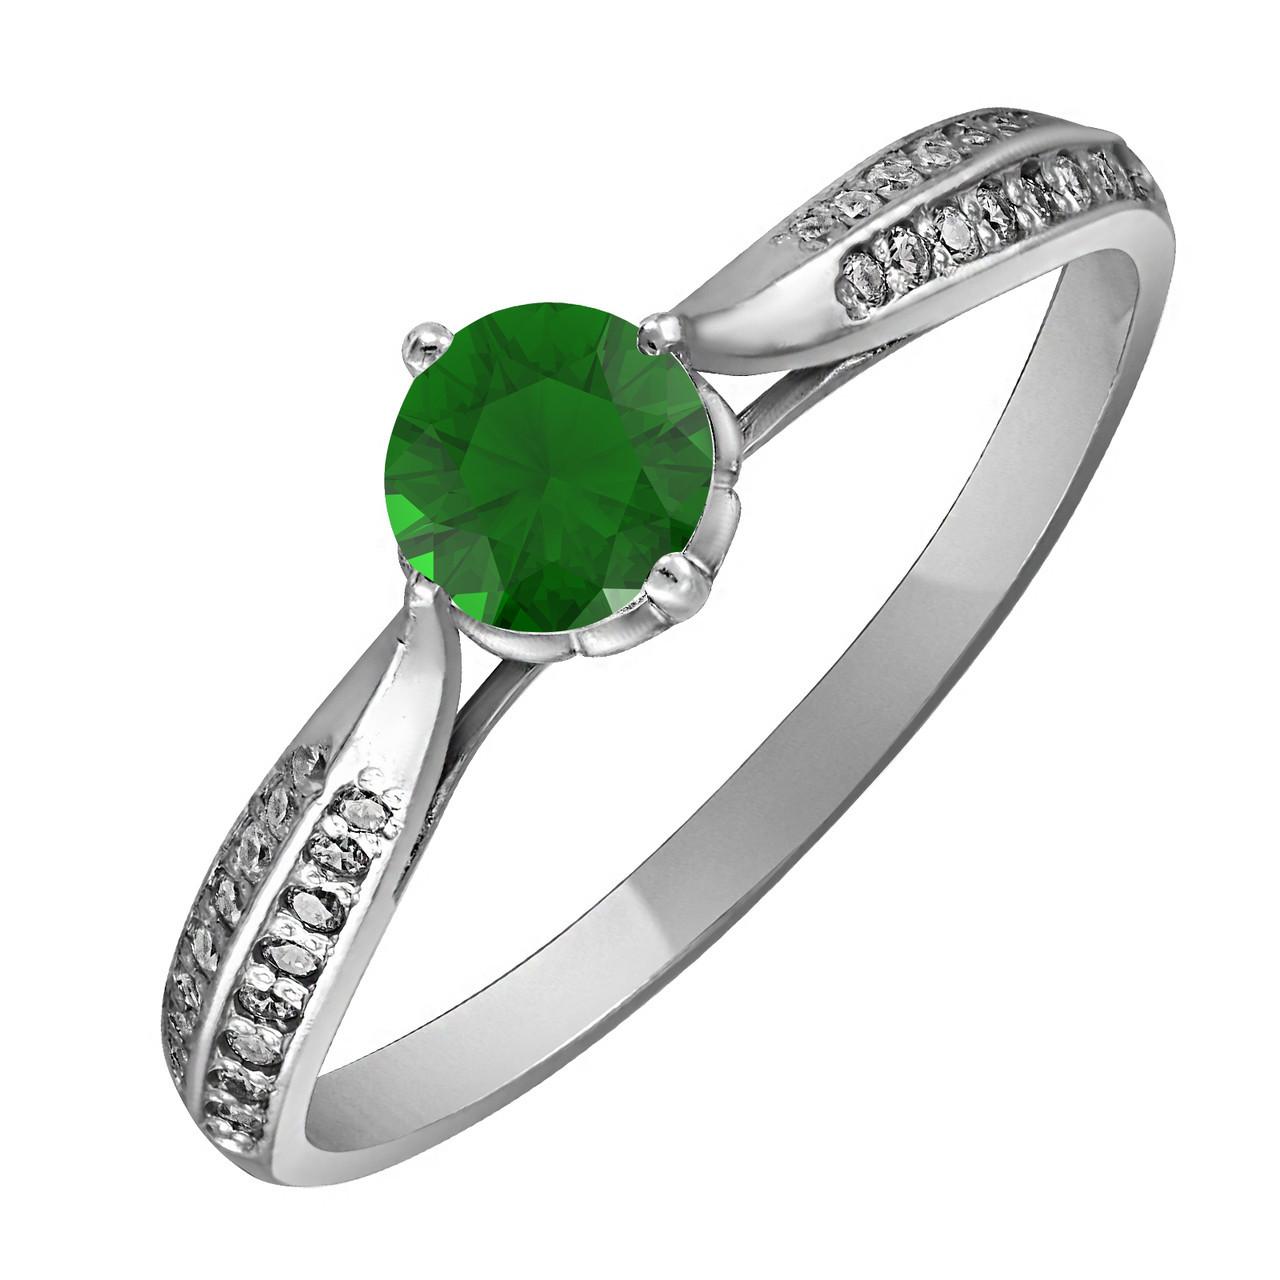 Кольцо из серебра с зелёным кубическим цирконием Twiddle Jewelry 20.0 размер (К007з-20.0)